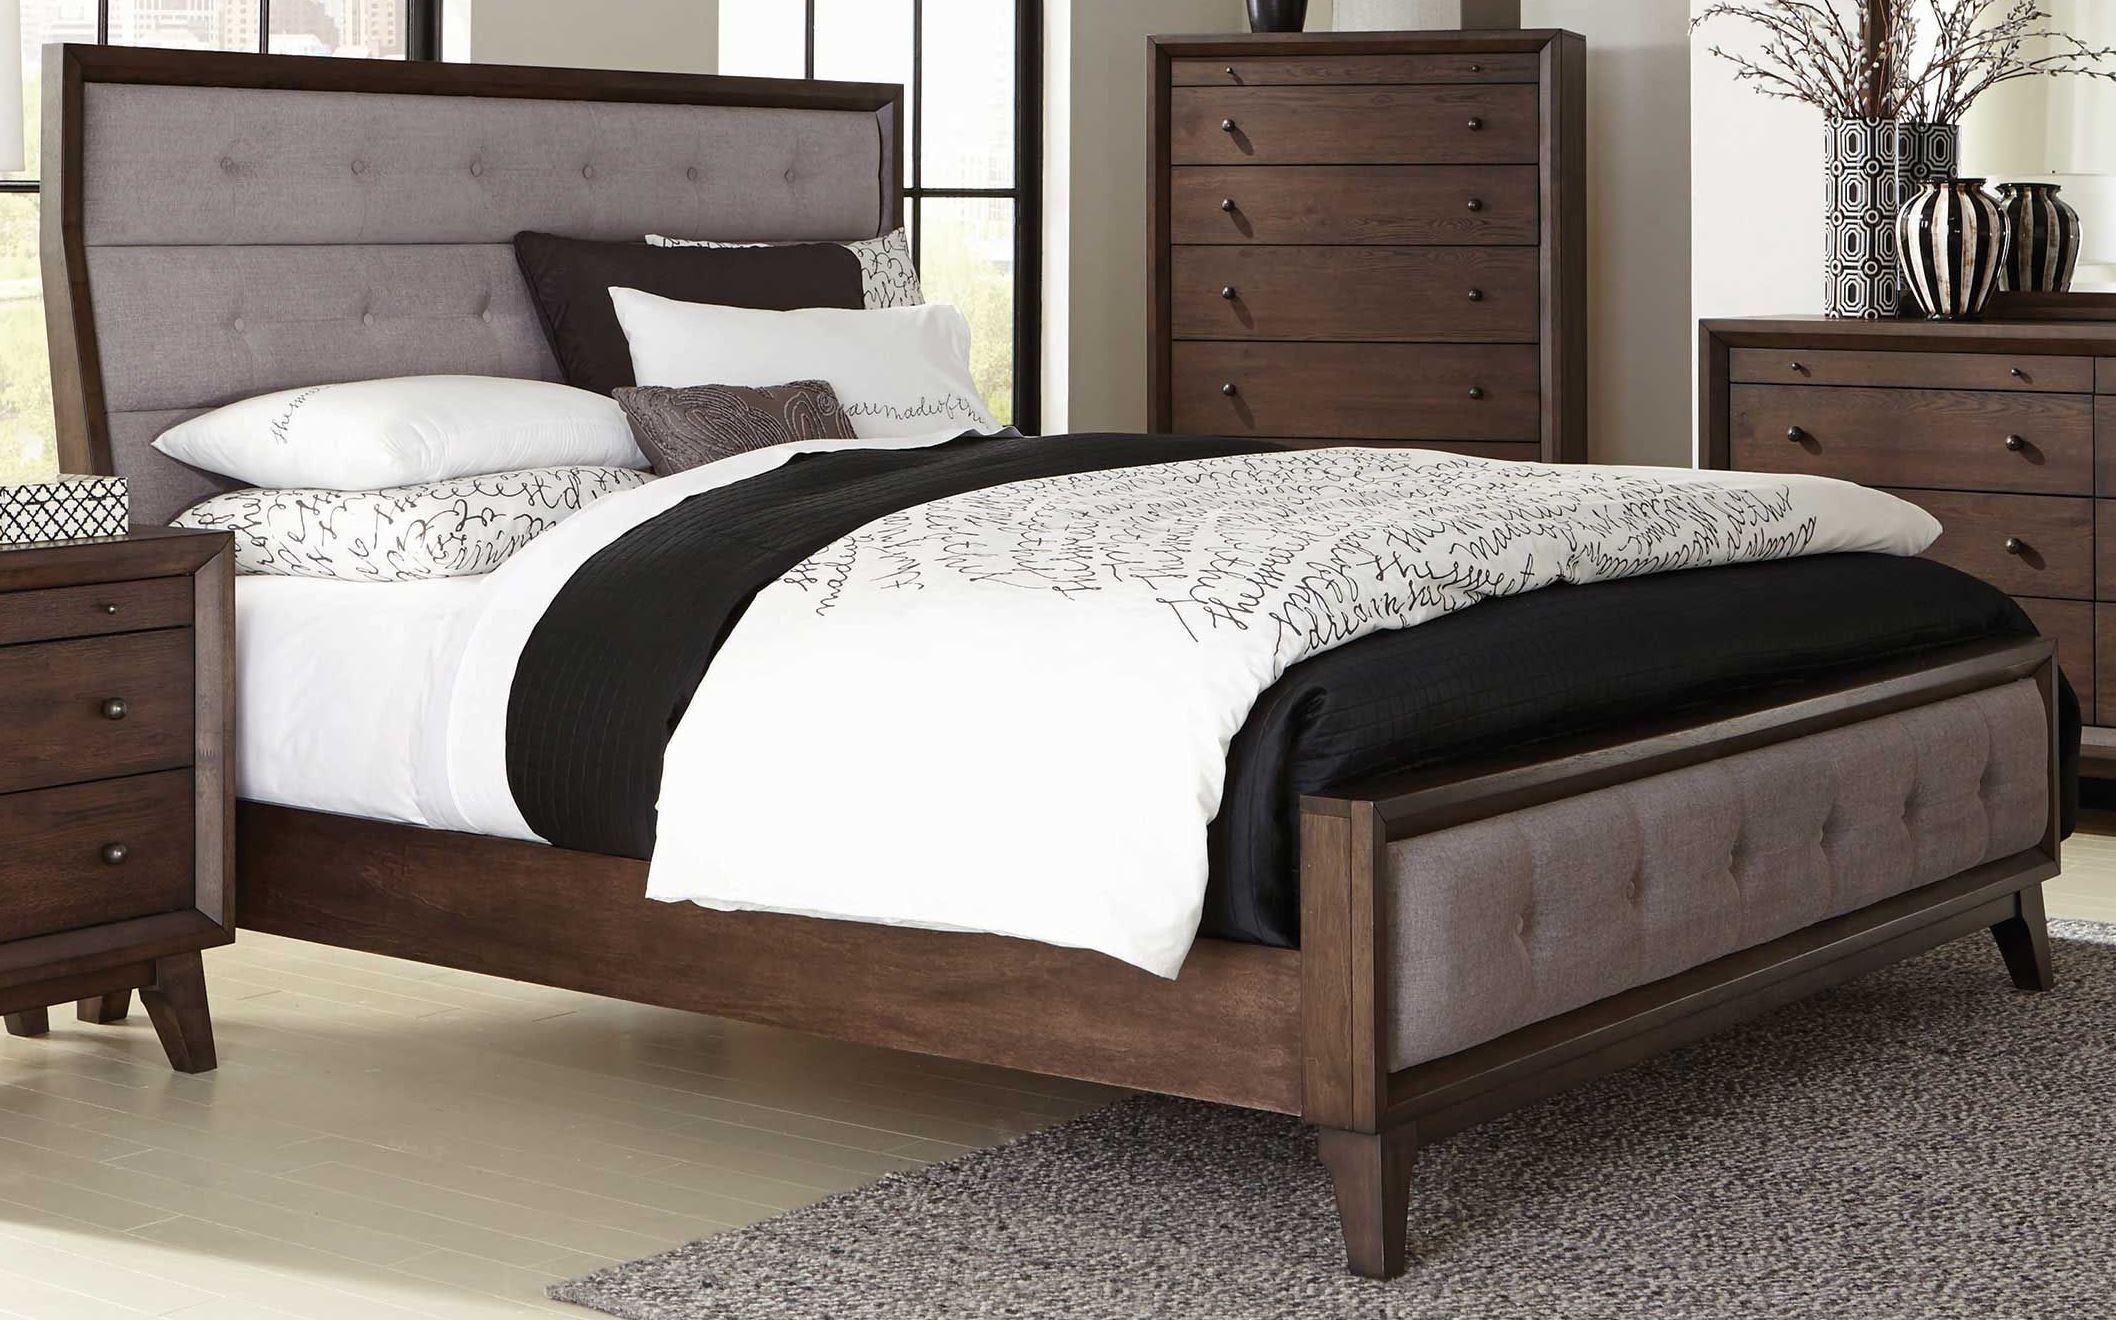 Bingham Brown Oak King Panel Bed From Coaster